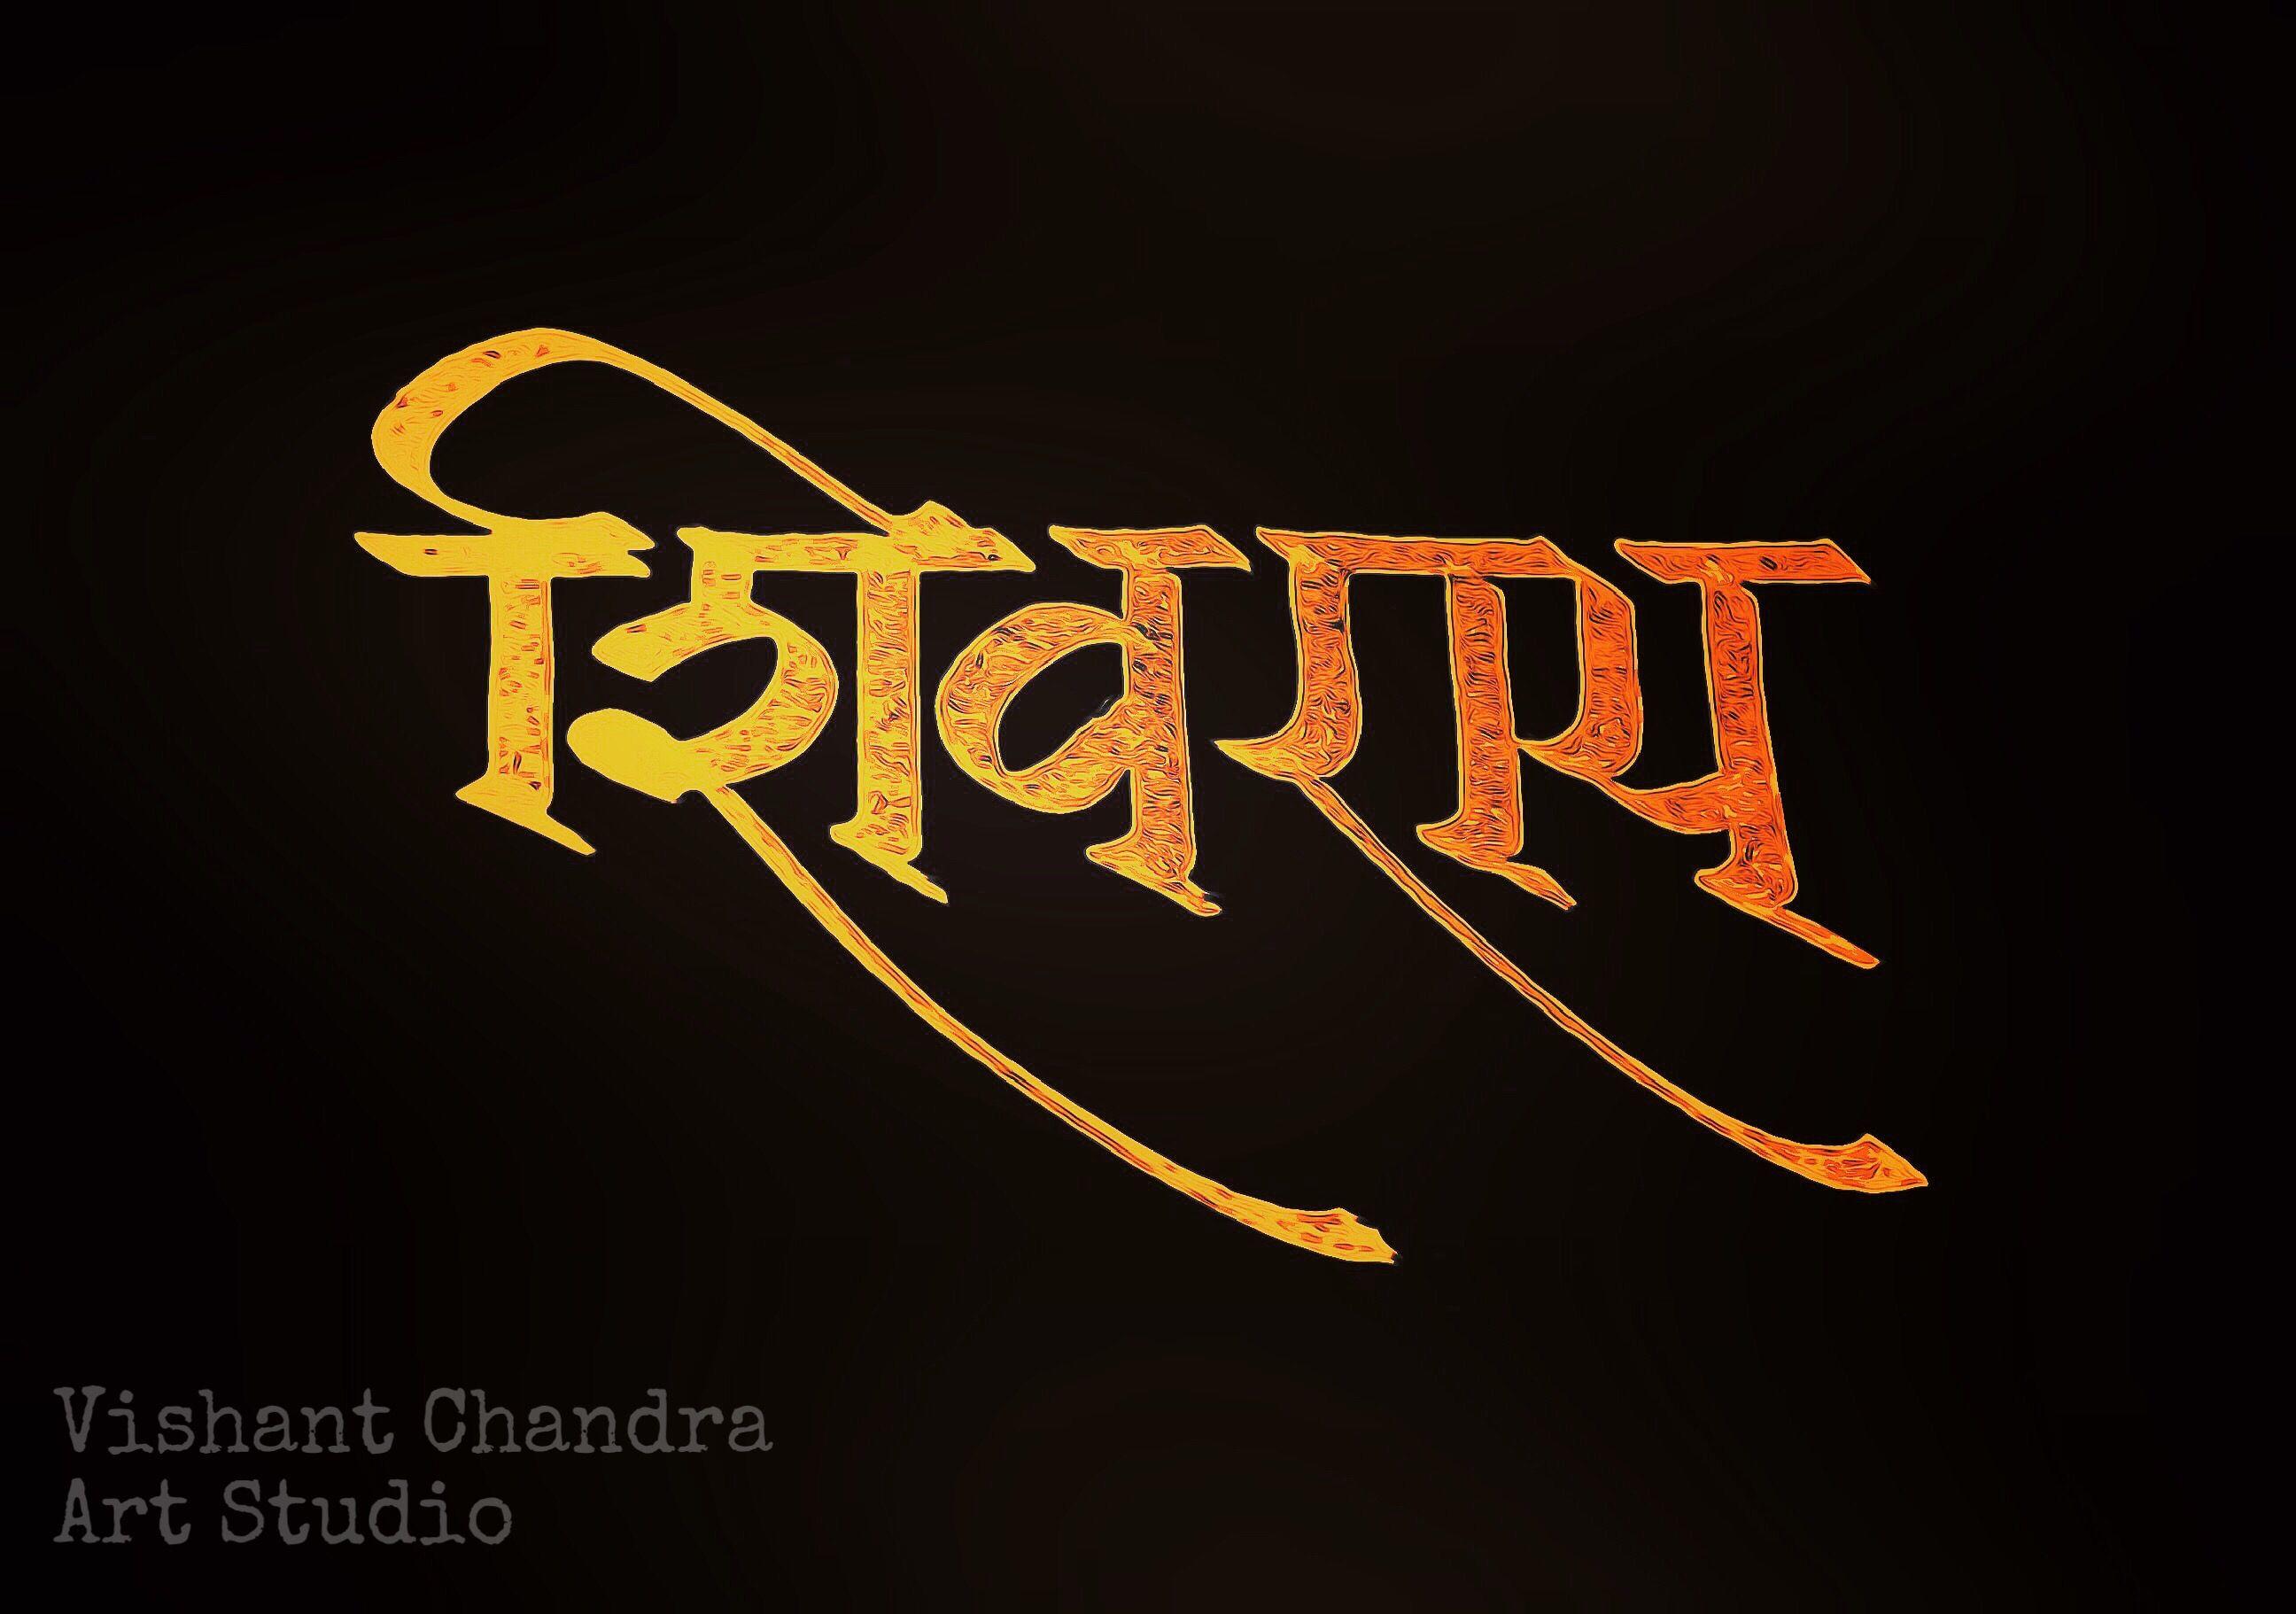 Pin By Jitendra On Shivaji Raje Marathi Calligraphy Font